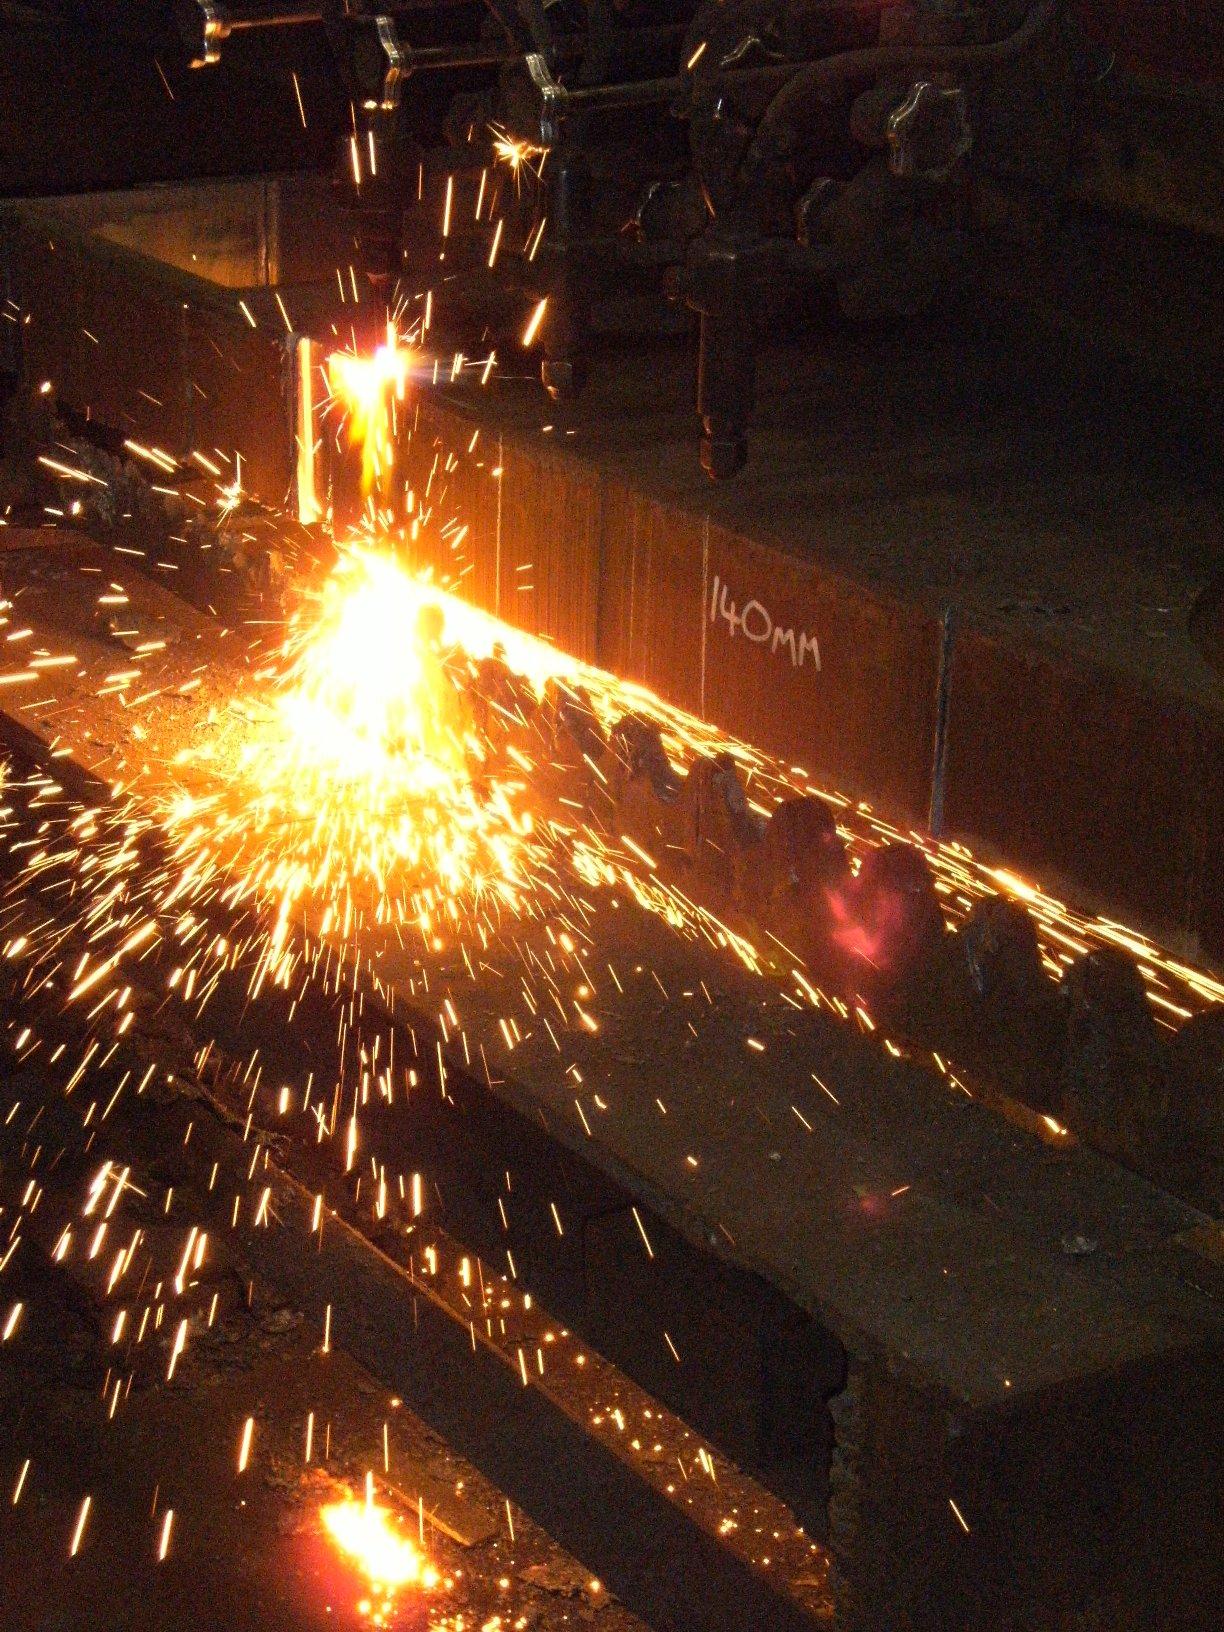 Profile cutting 140mm grade s355 steels